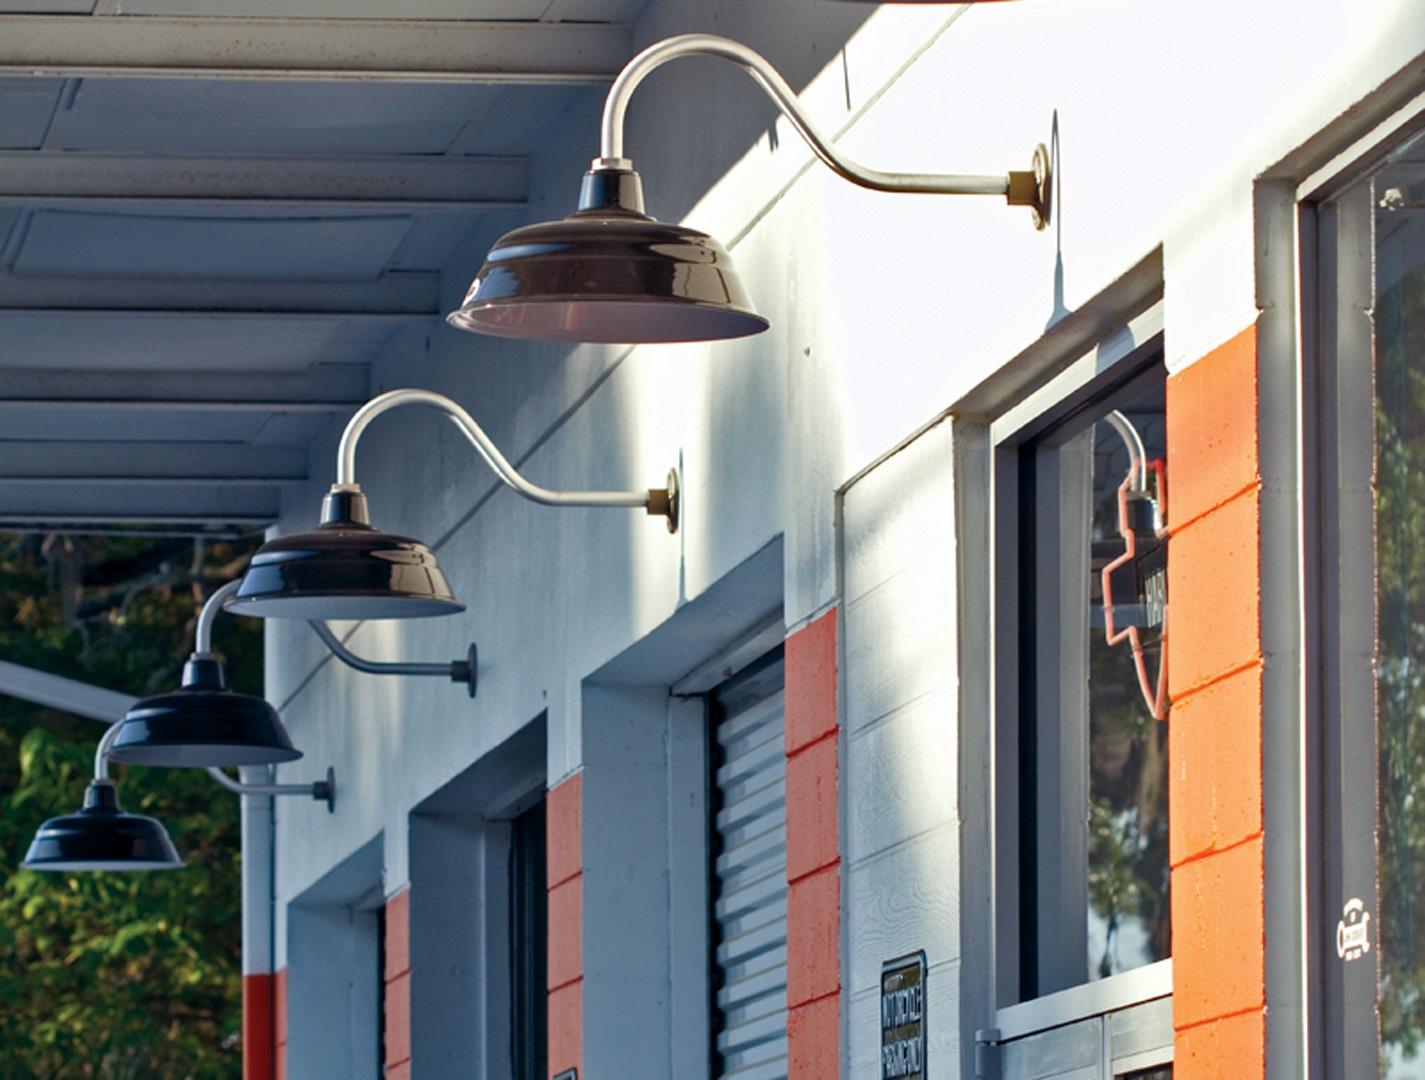 Porcelain enamel lends rugged style to commercial lighting blog for Commercial exterior gooseneck light fixtures